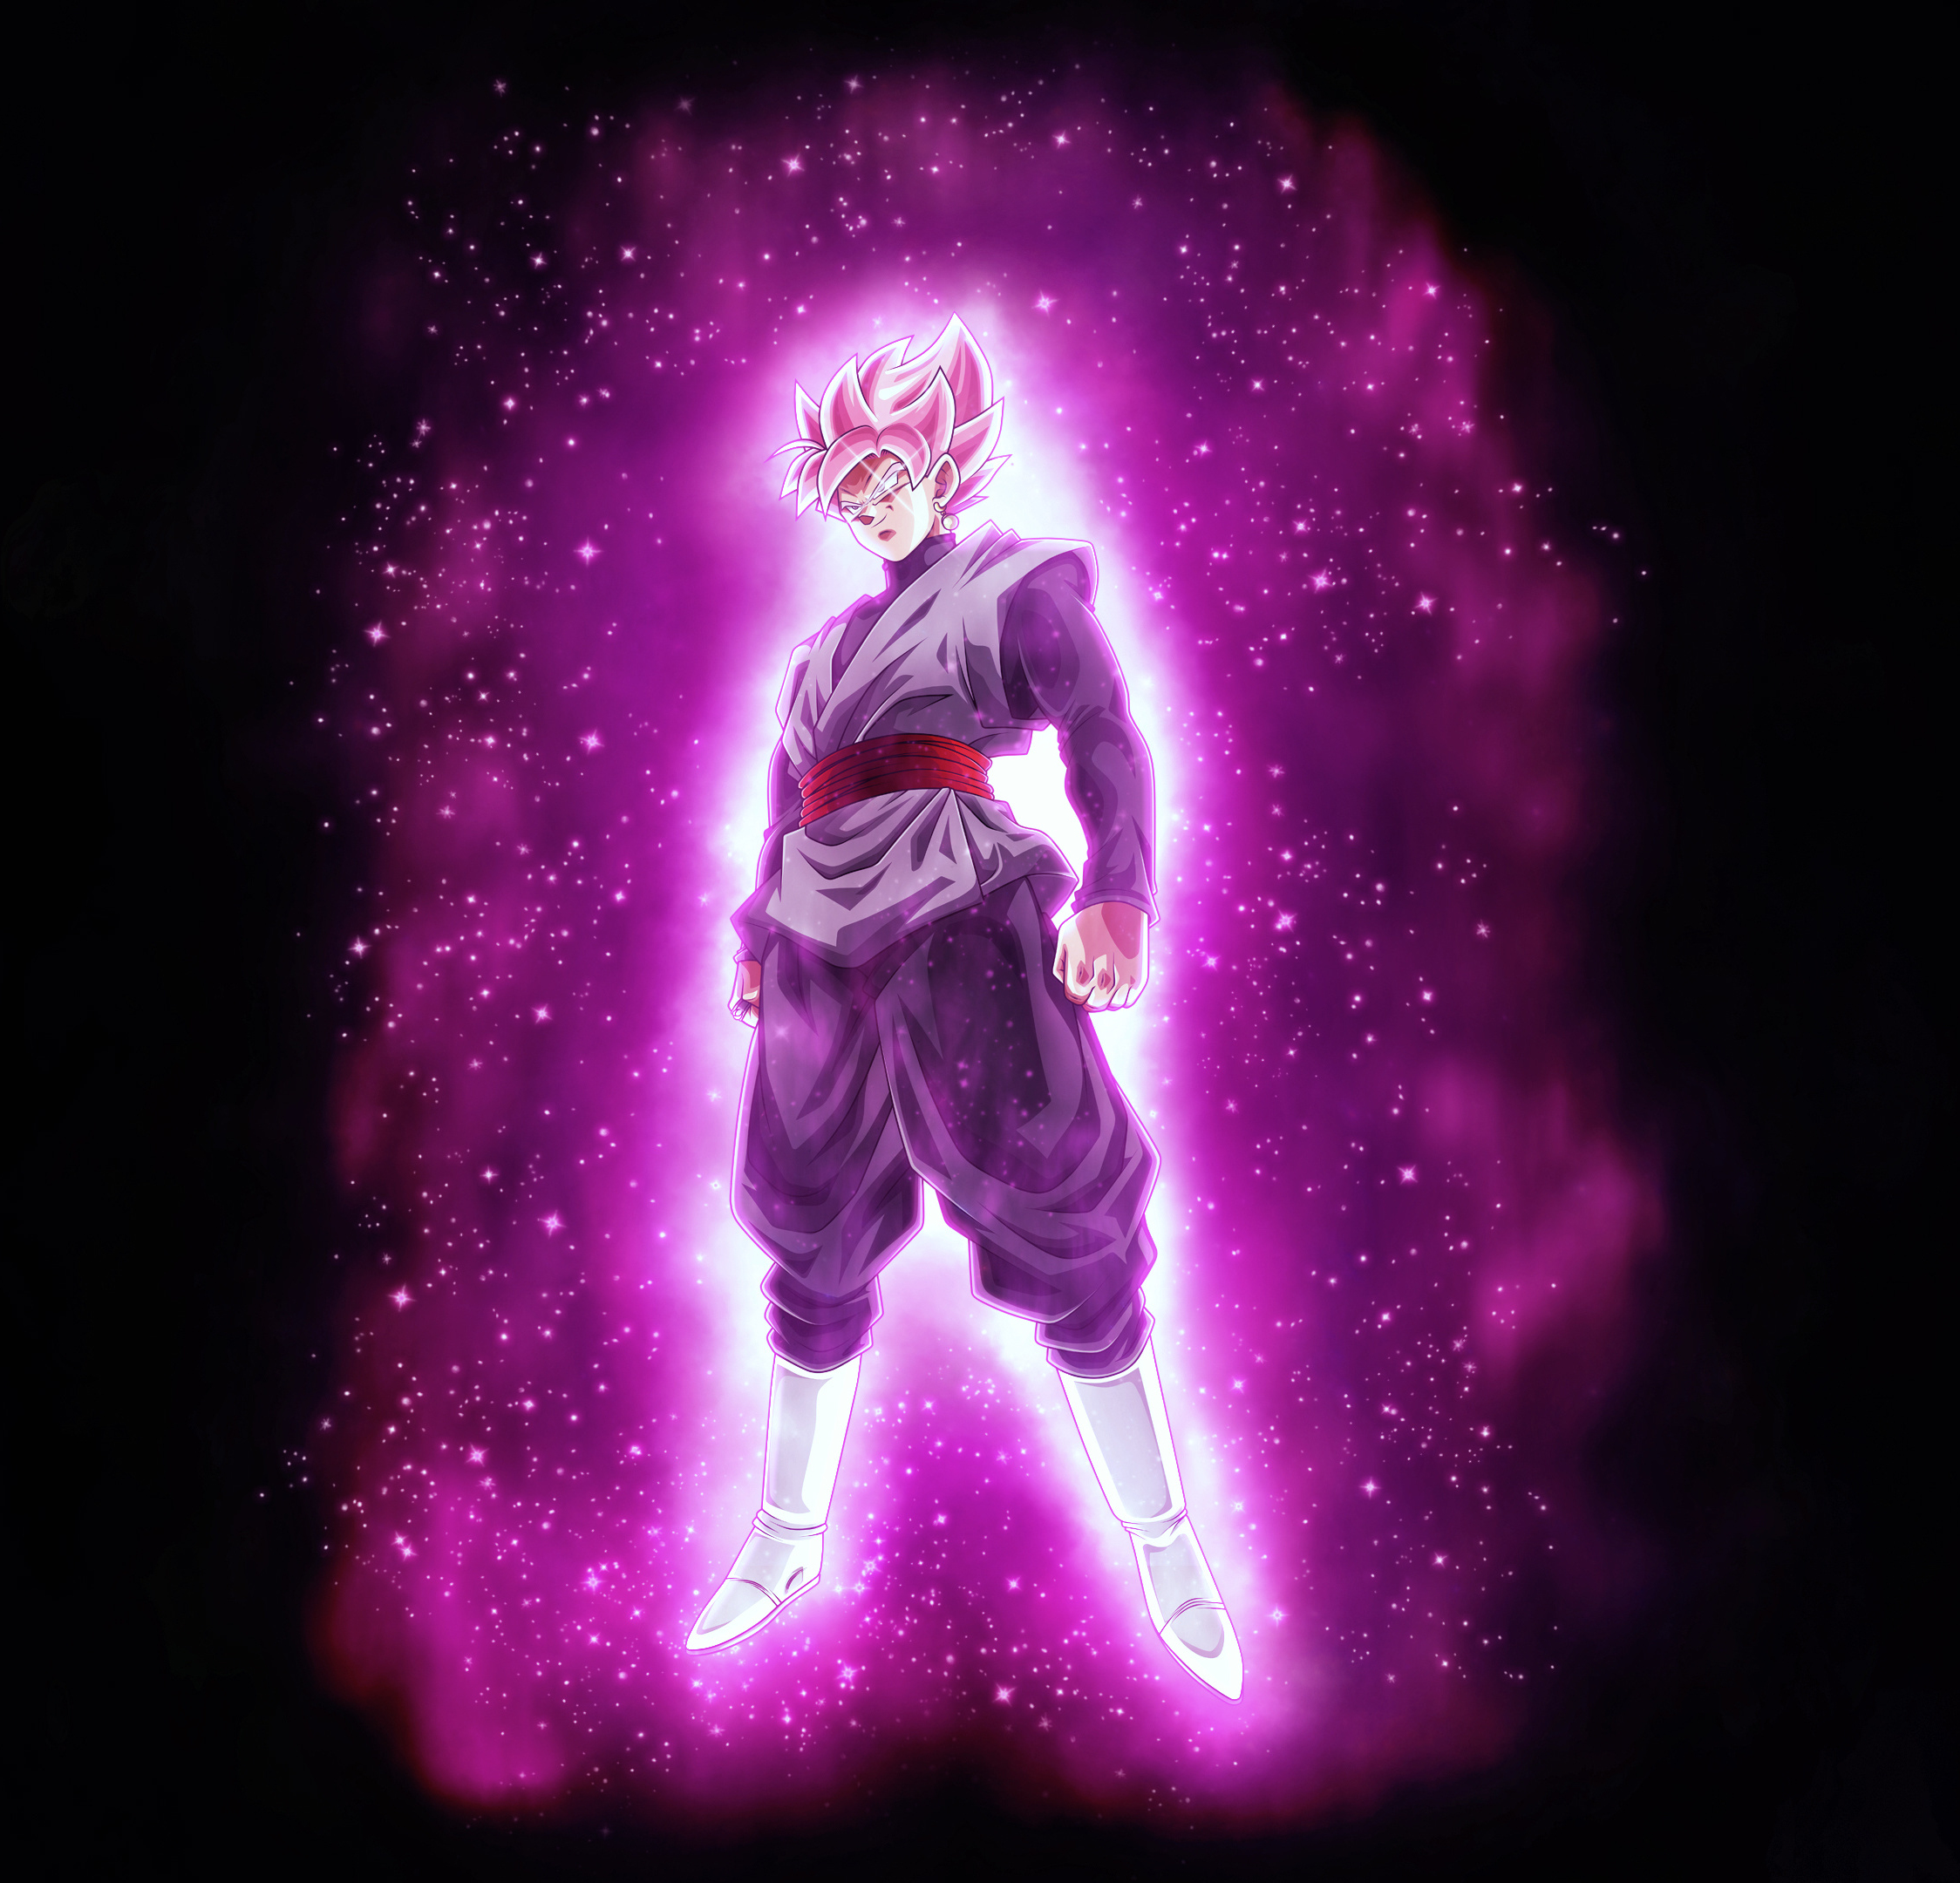 Download 2248x2248 Wallpaper Black Goku Ultra Instinct